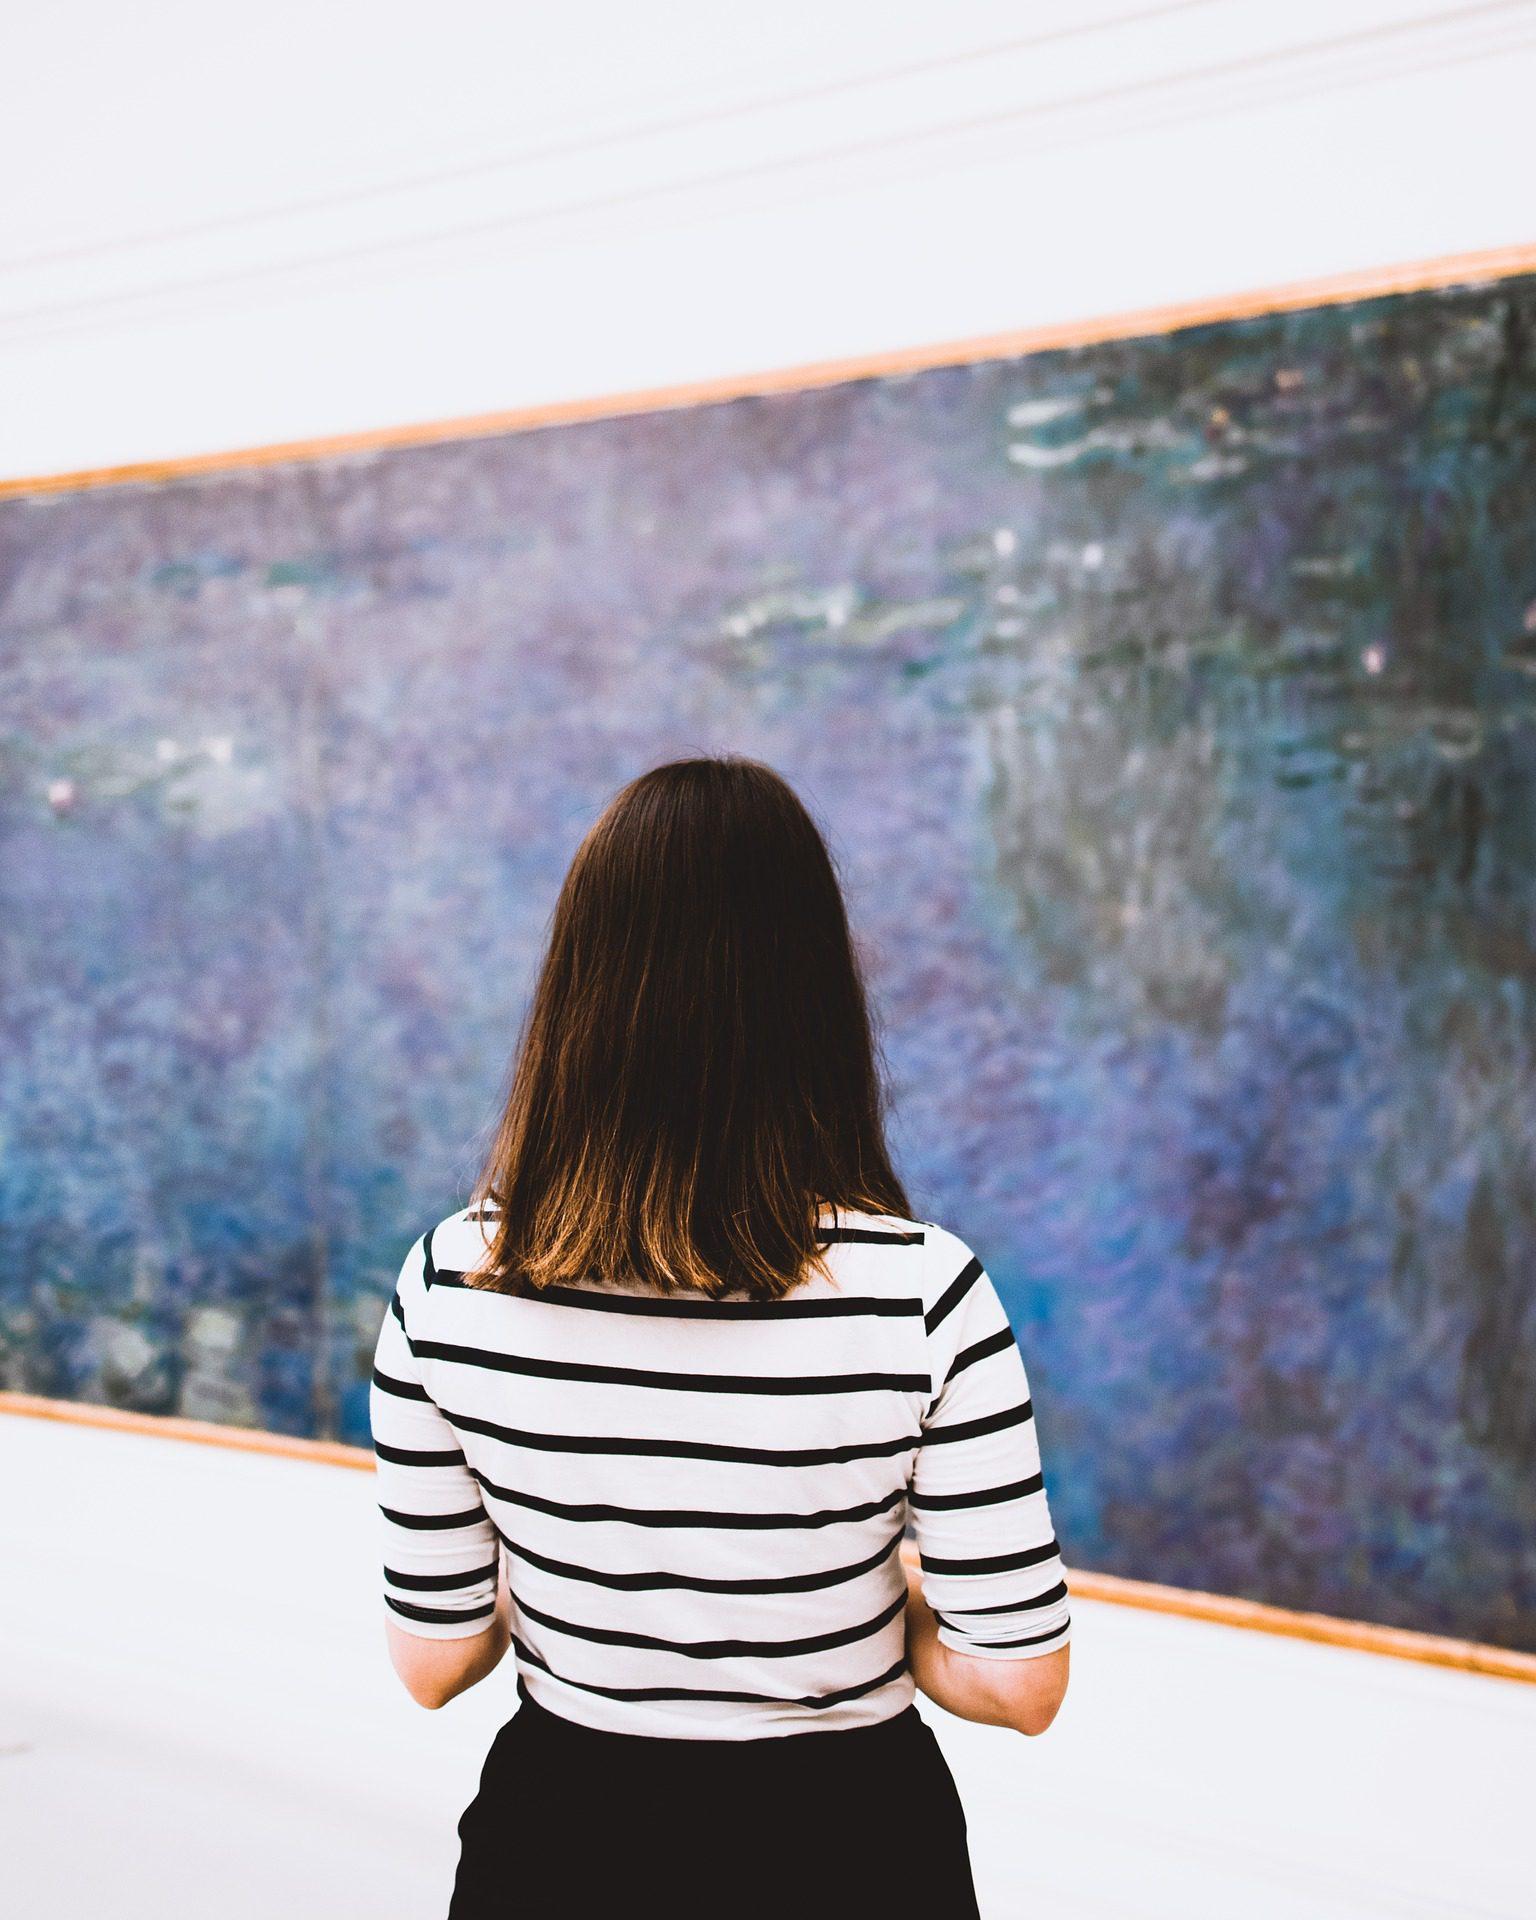 Monet's Water Lilies at Musee l'Orangerie, Paris